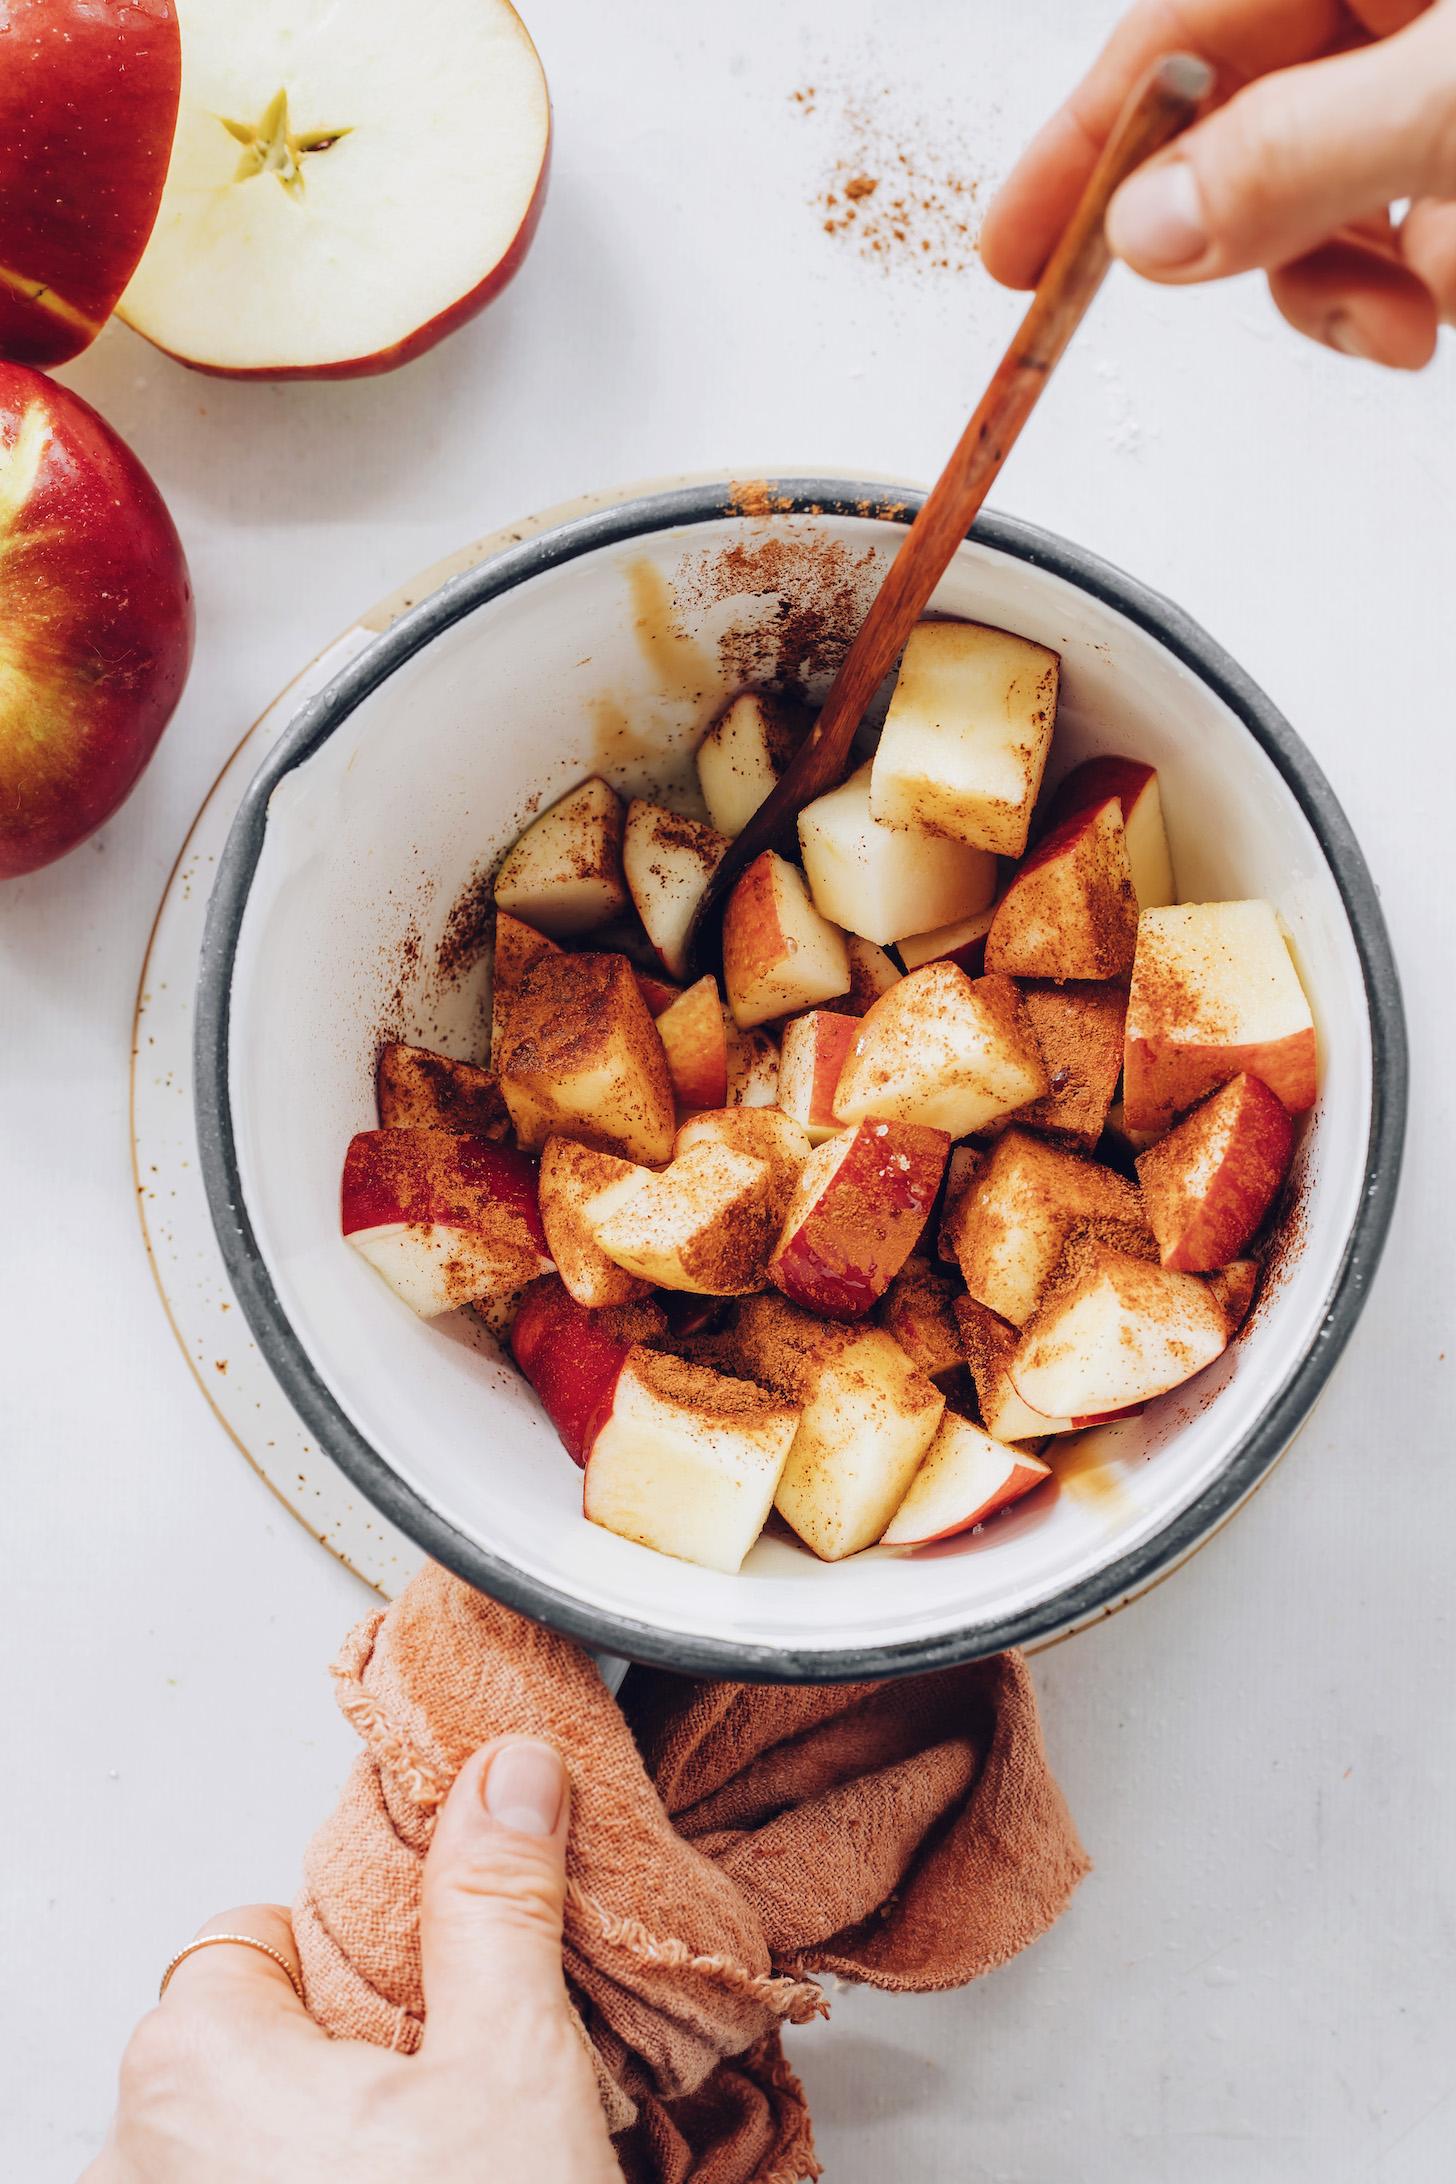 Saucepan of chopped apples with cinnamon